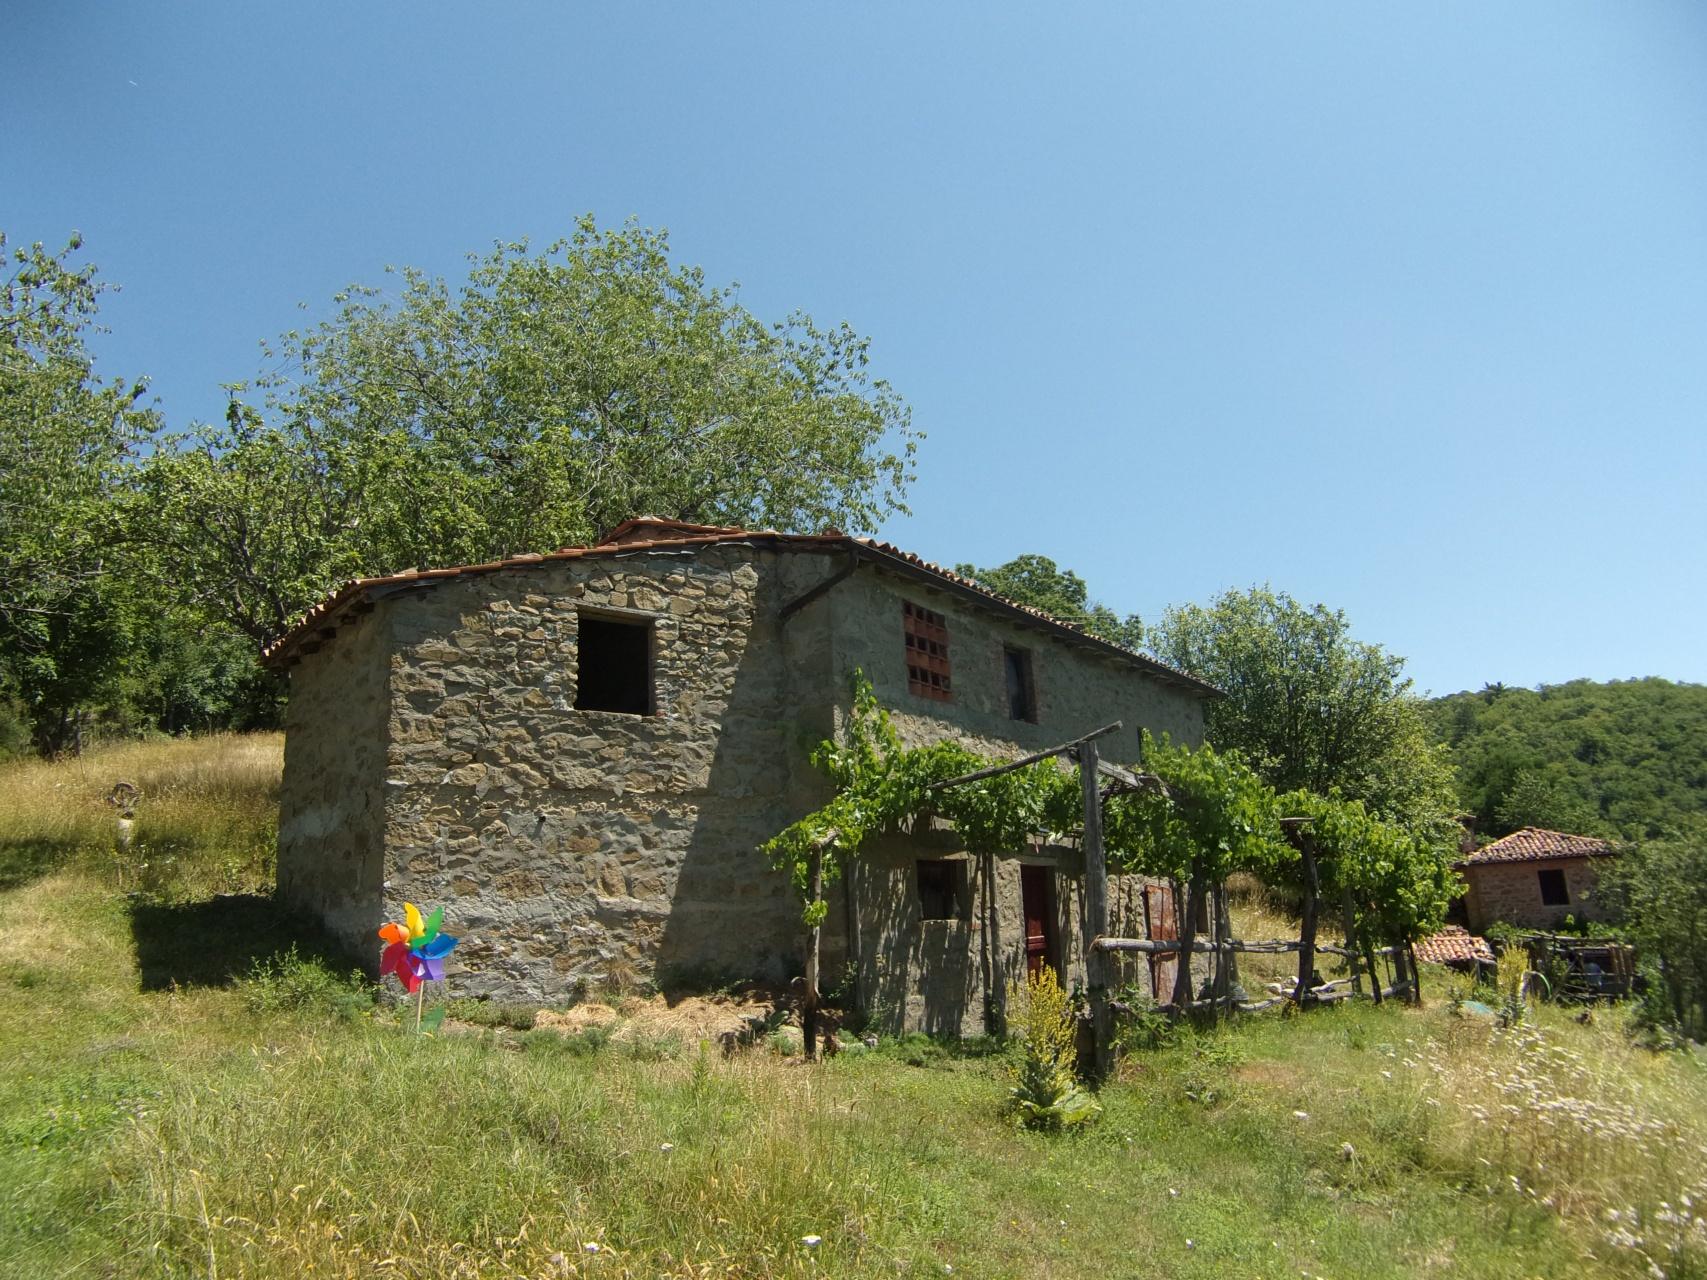 foto Coppia di edifici rurali poste in 9 ettari di terreno in tenuta recintata, Barga, Lucca, Toscana.